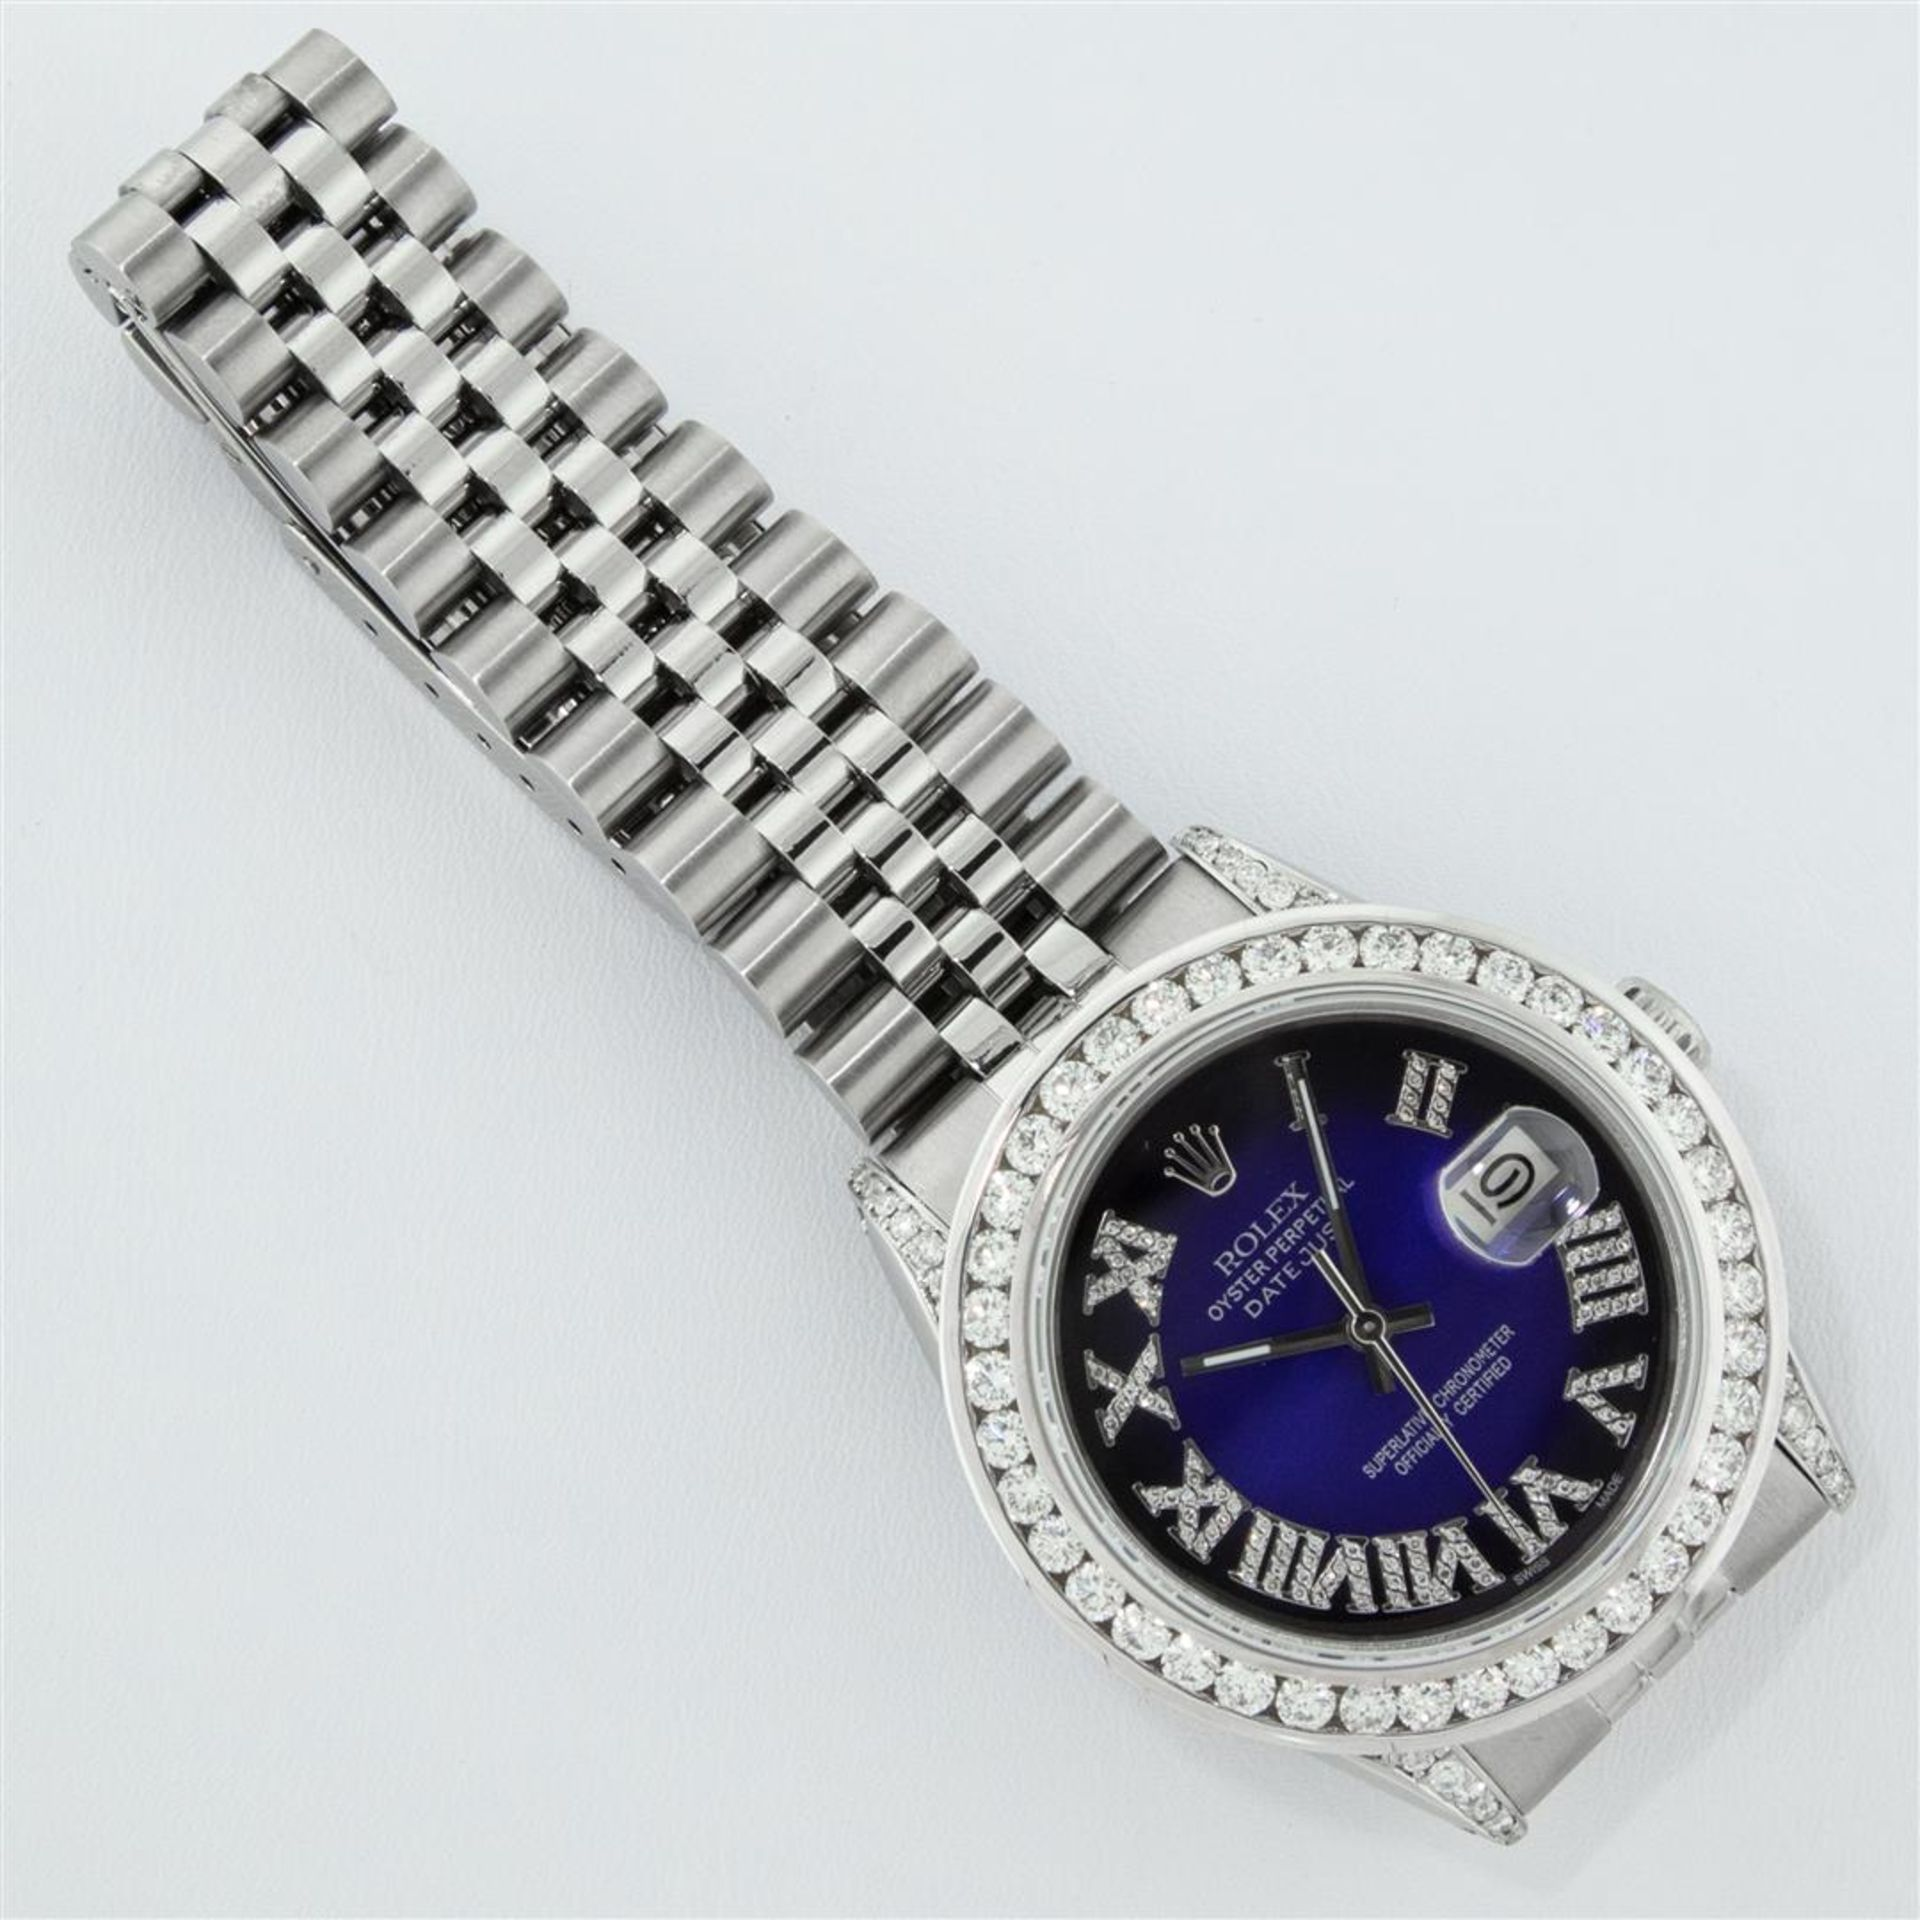 Rolex Mens Stainless Steel Blue Vignette Roman 3ctw Diamond Datejust Wristwatch - Image 6 of 9